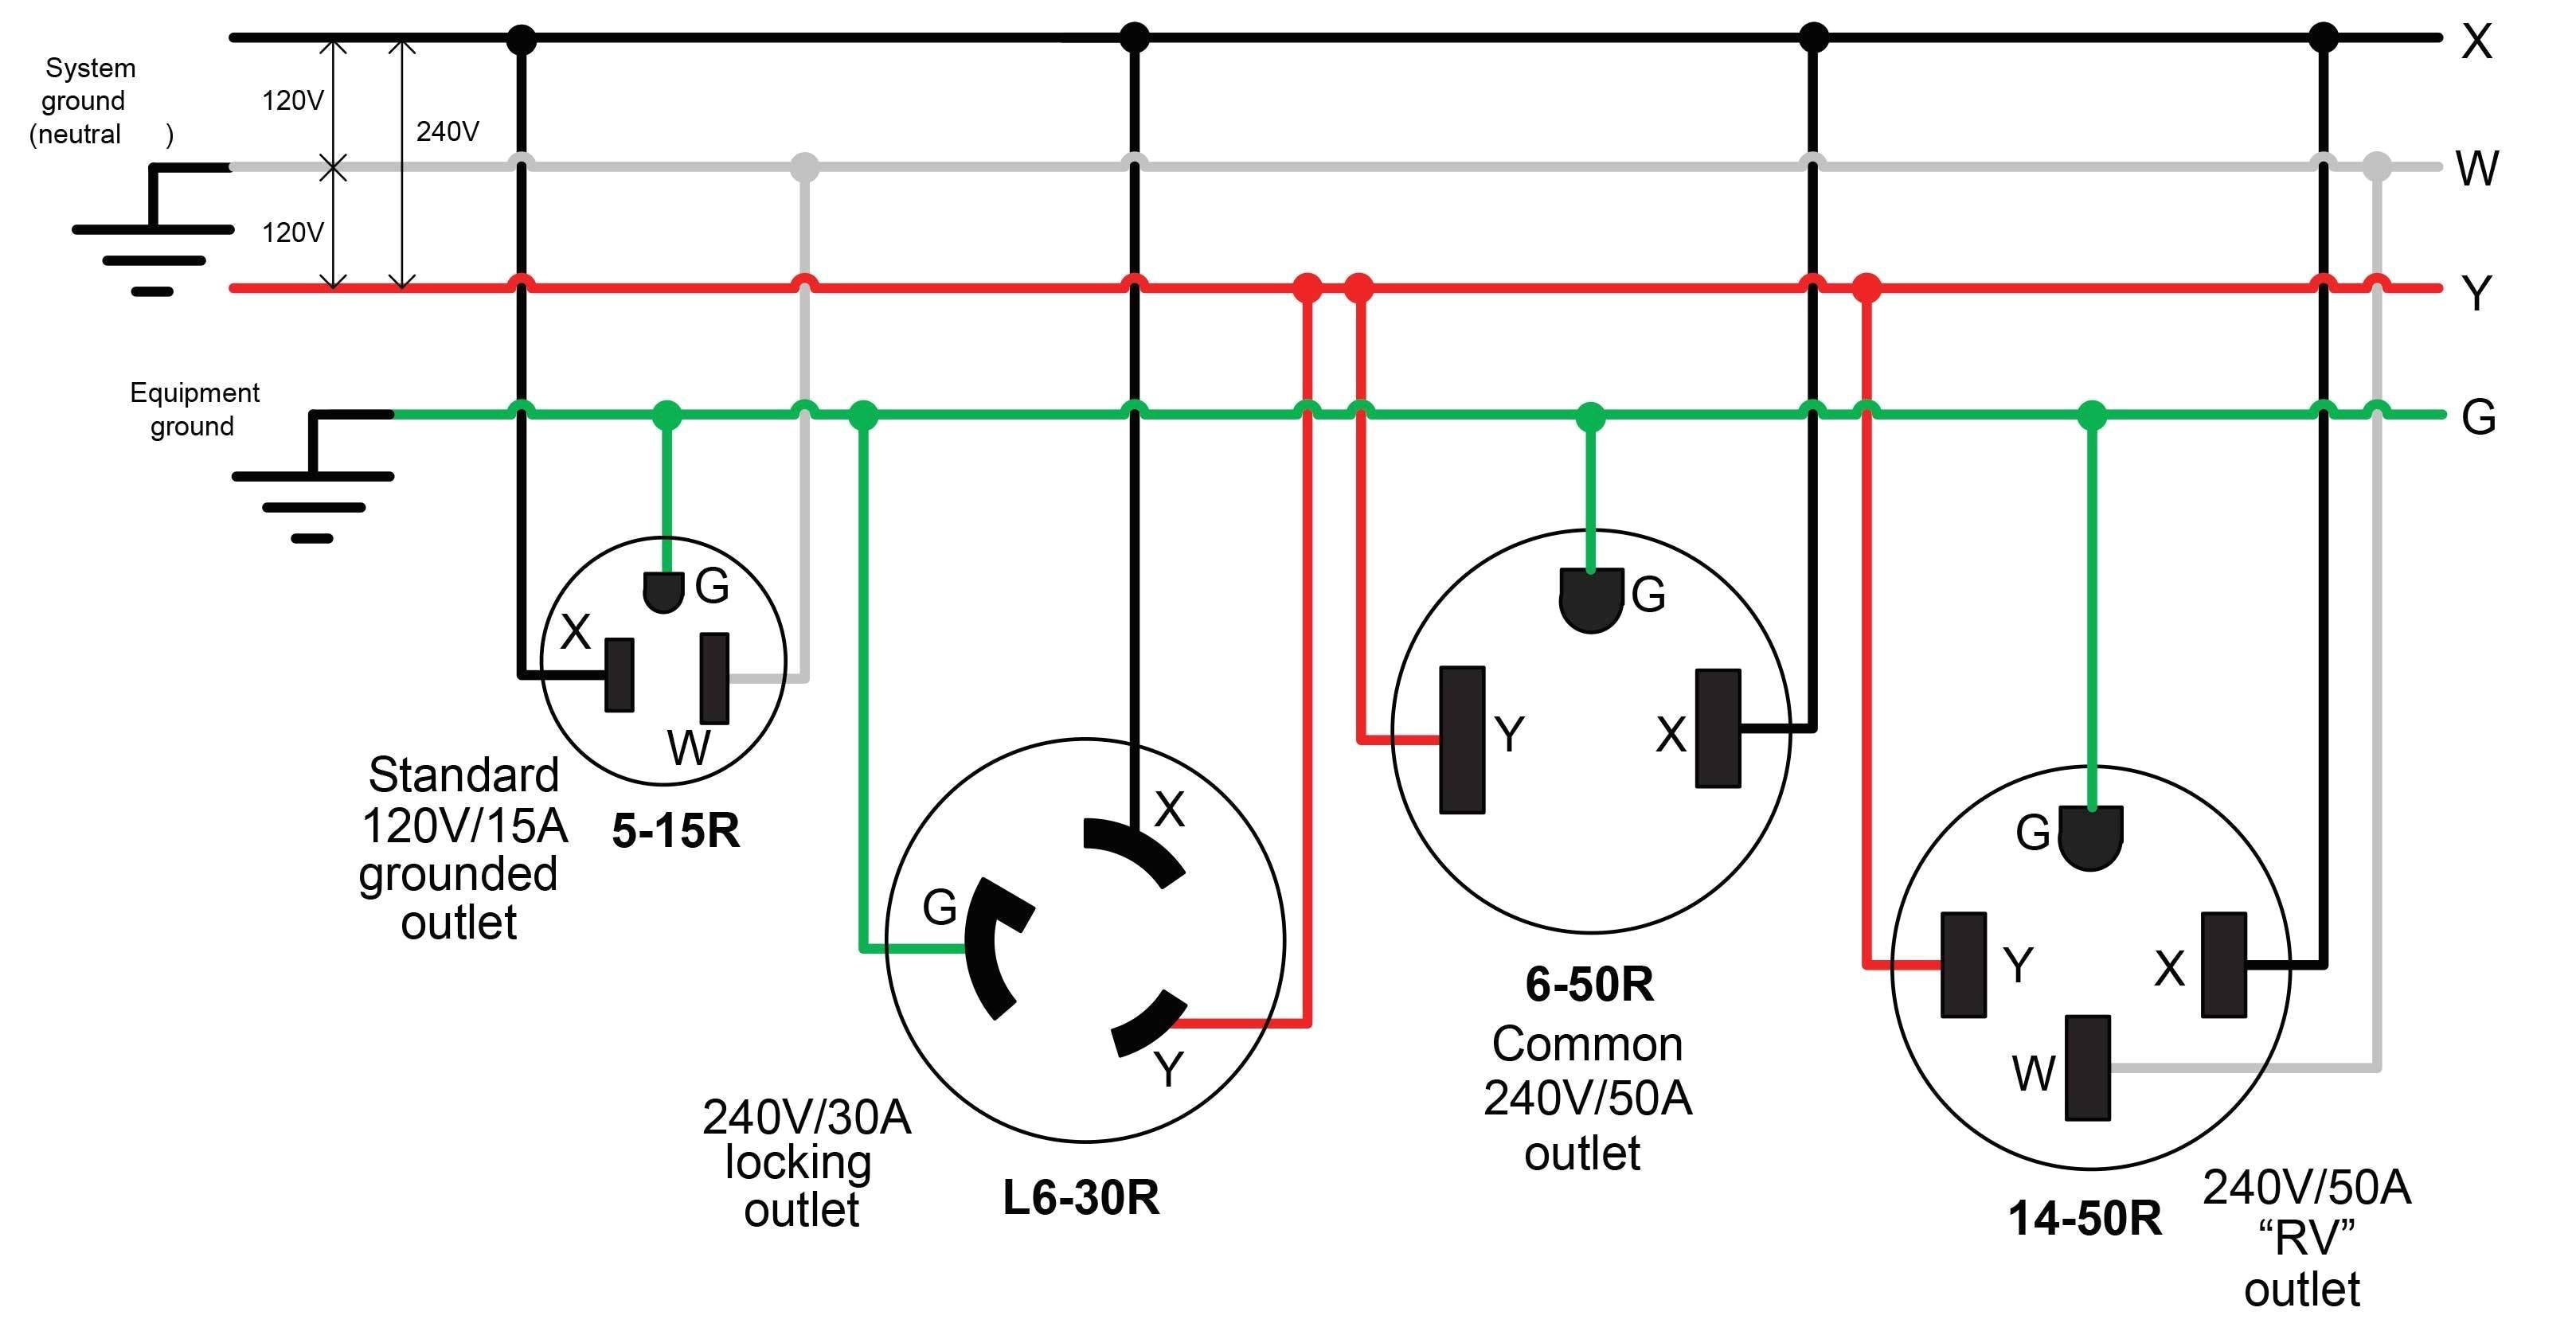 xd_2916] wiring a 20a 250v schematic schematic wiring 20a 125250v locking plug wiring diagram 20 amp twist lock plug wiring diagram favo.lacu.dict.cajos.mohammedshrine.org